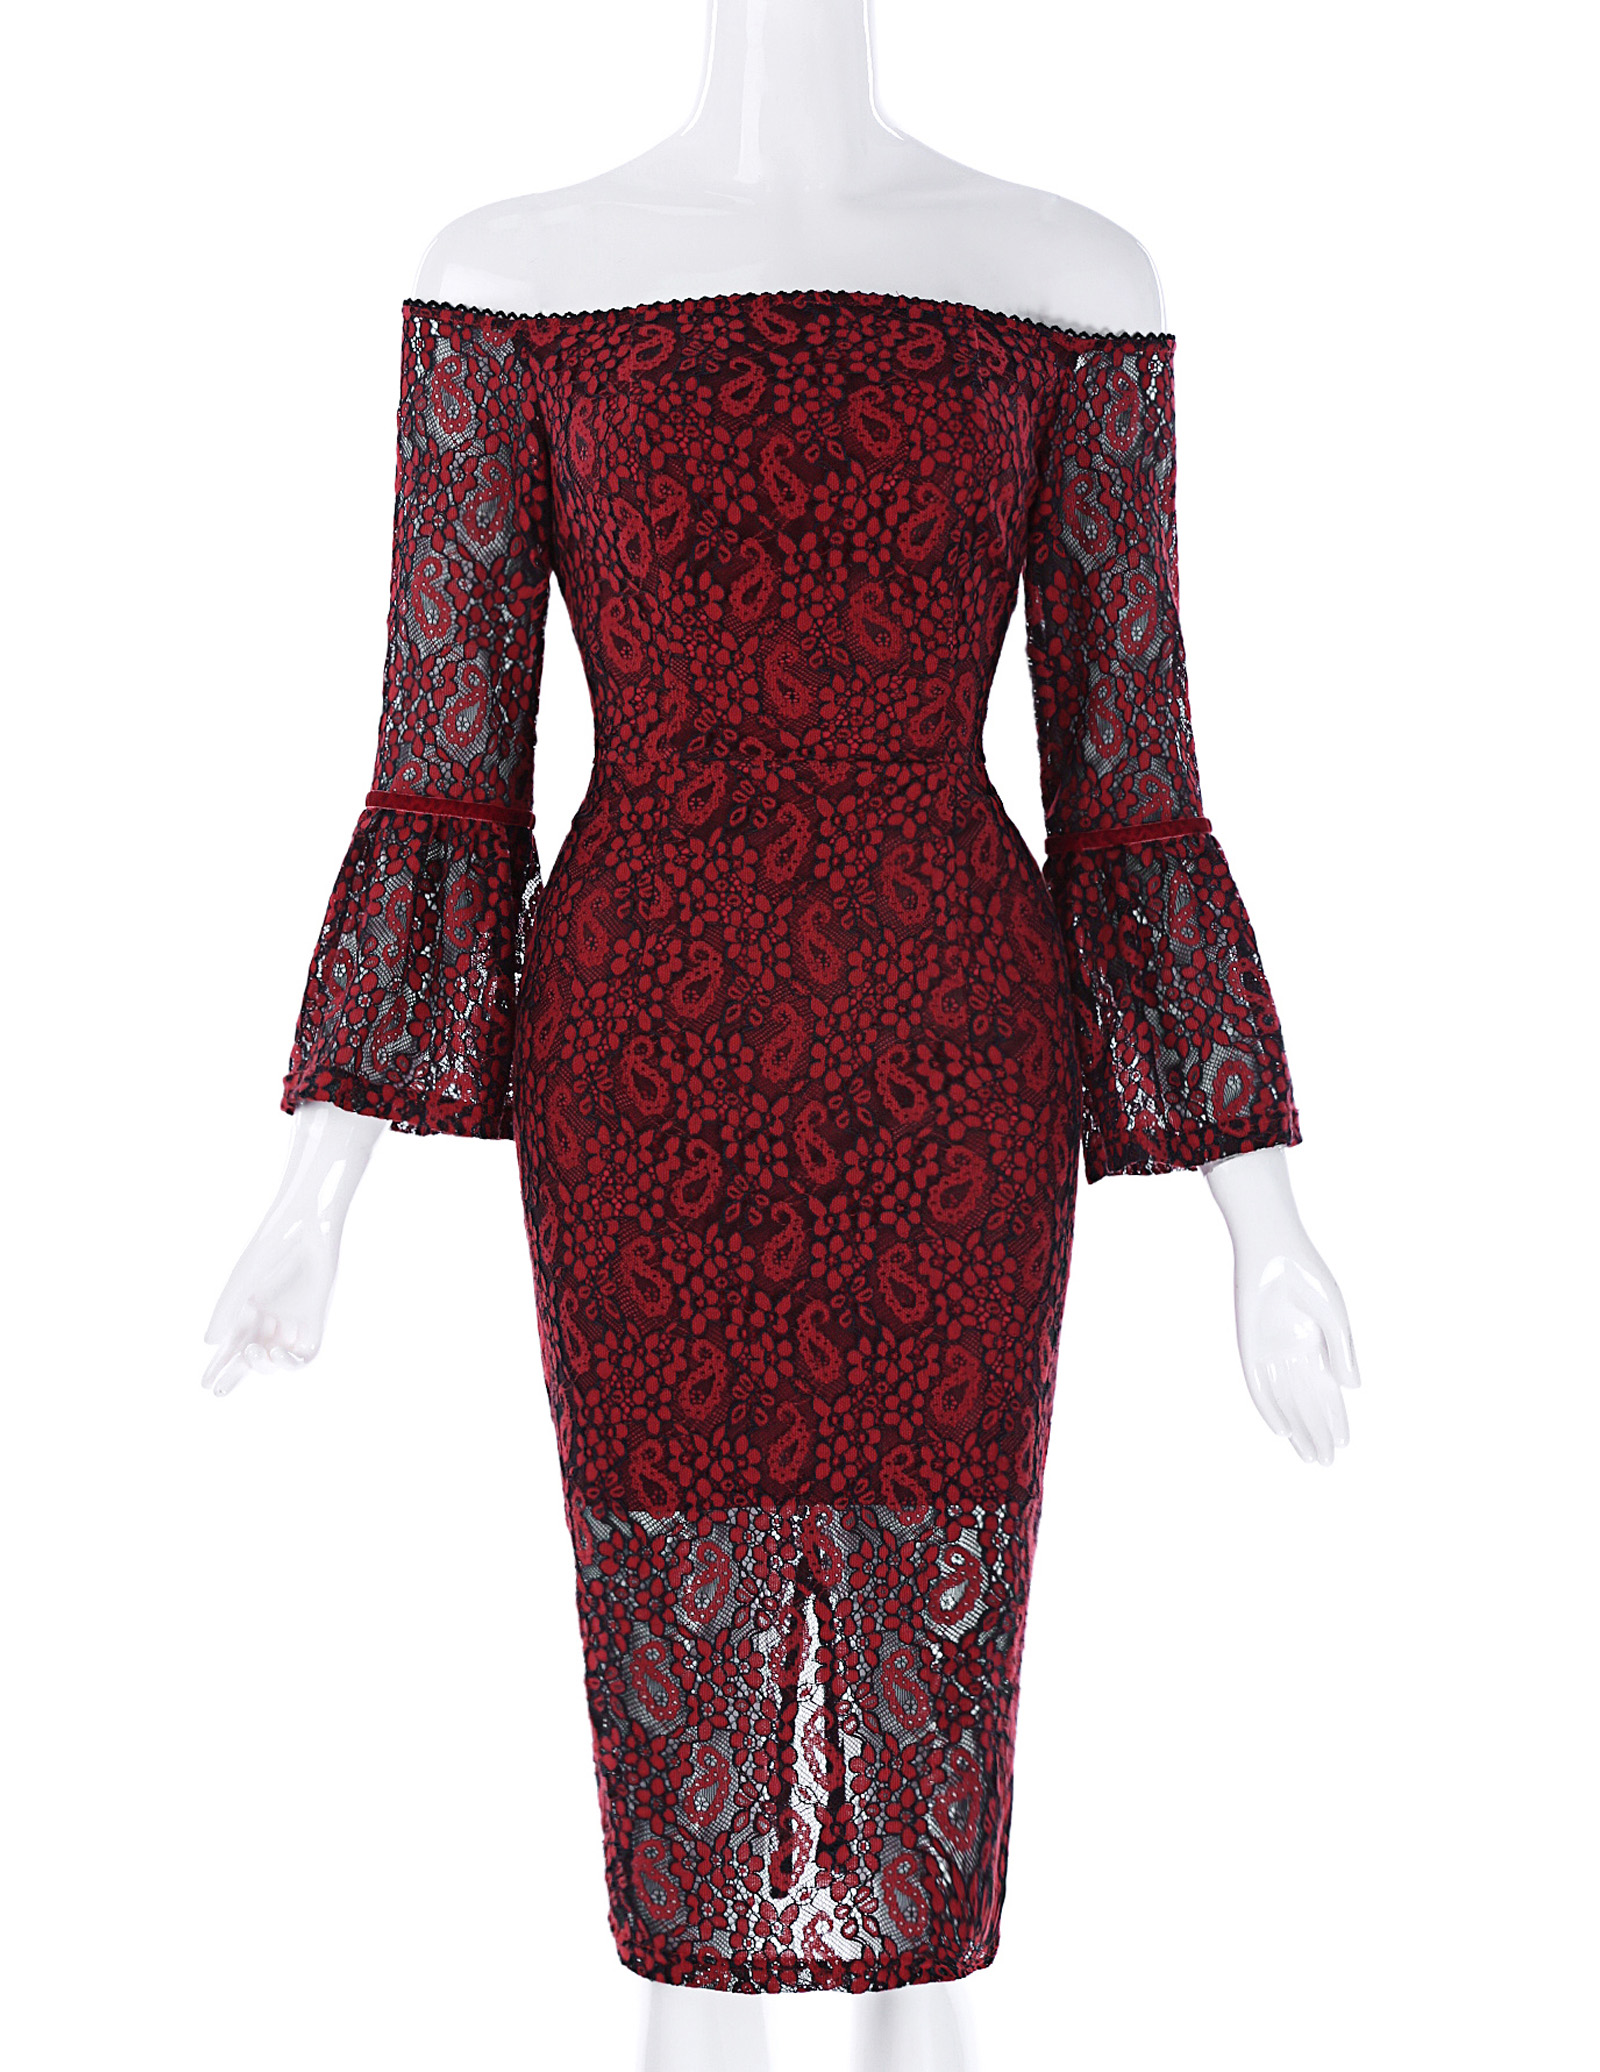 Lantern Sleeve Lace Cocktail Dress 2018 Elegant Re...